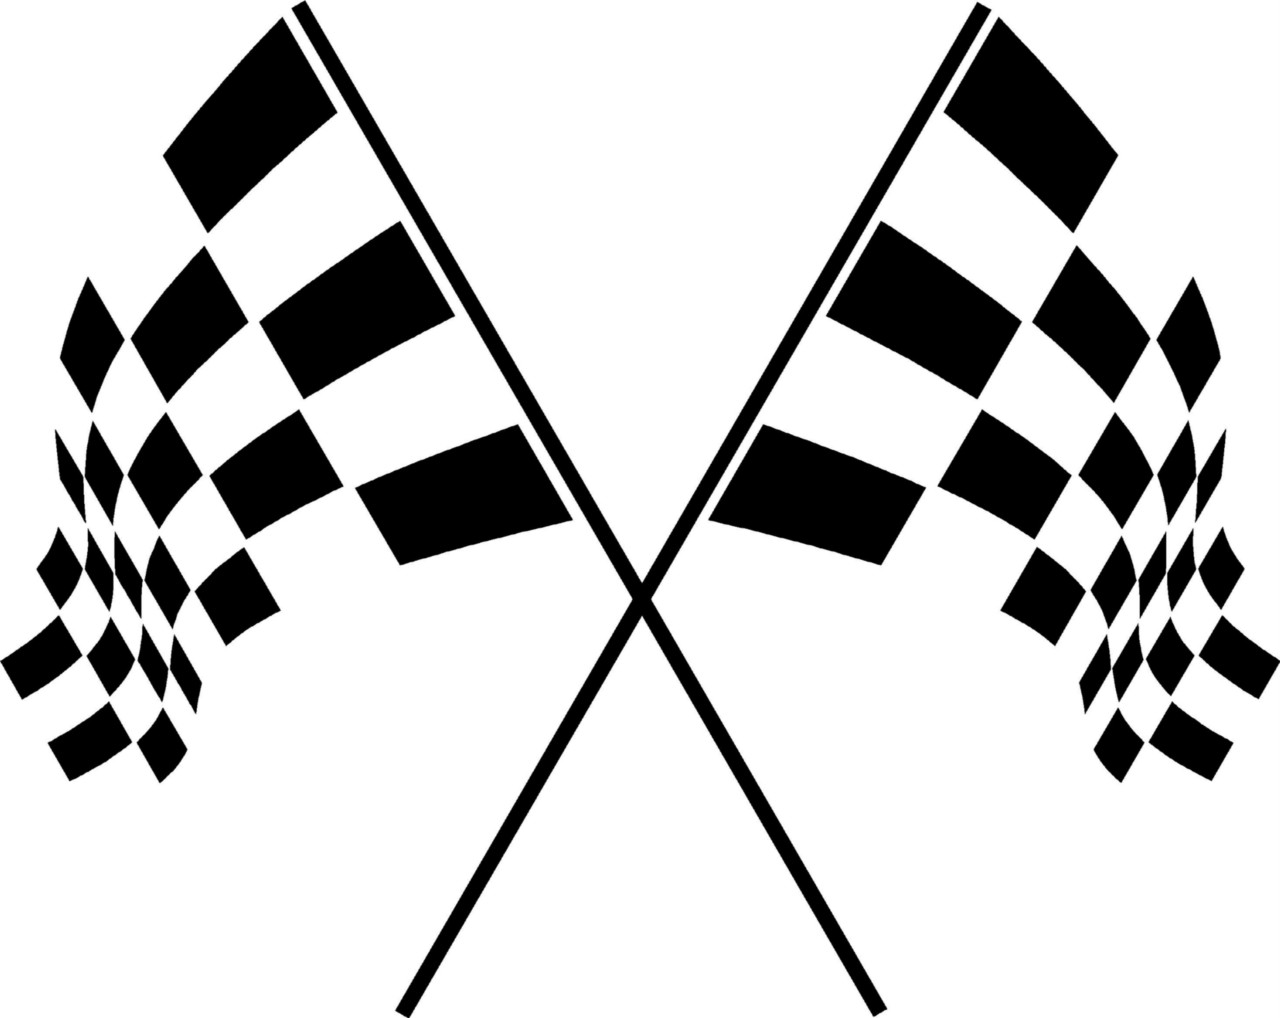 Checkered Racing Flags Vinyl Wall Decal Sticker Art Room Decor Office Garage